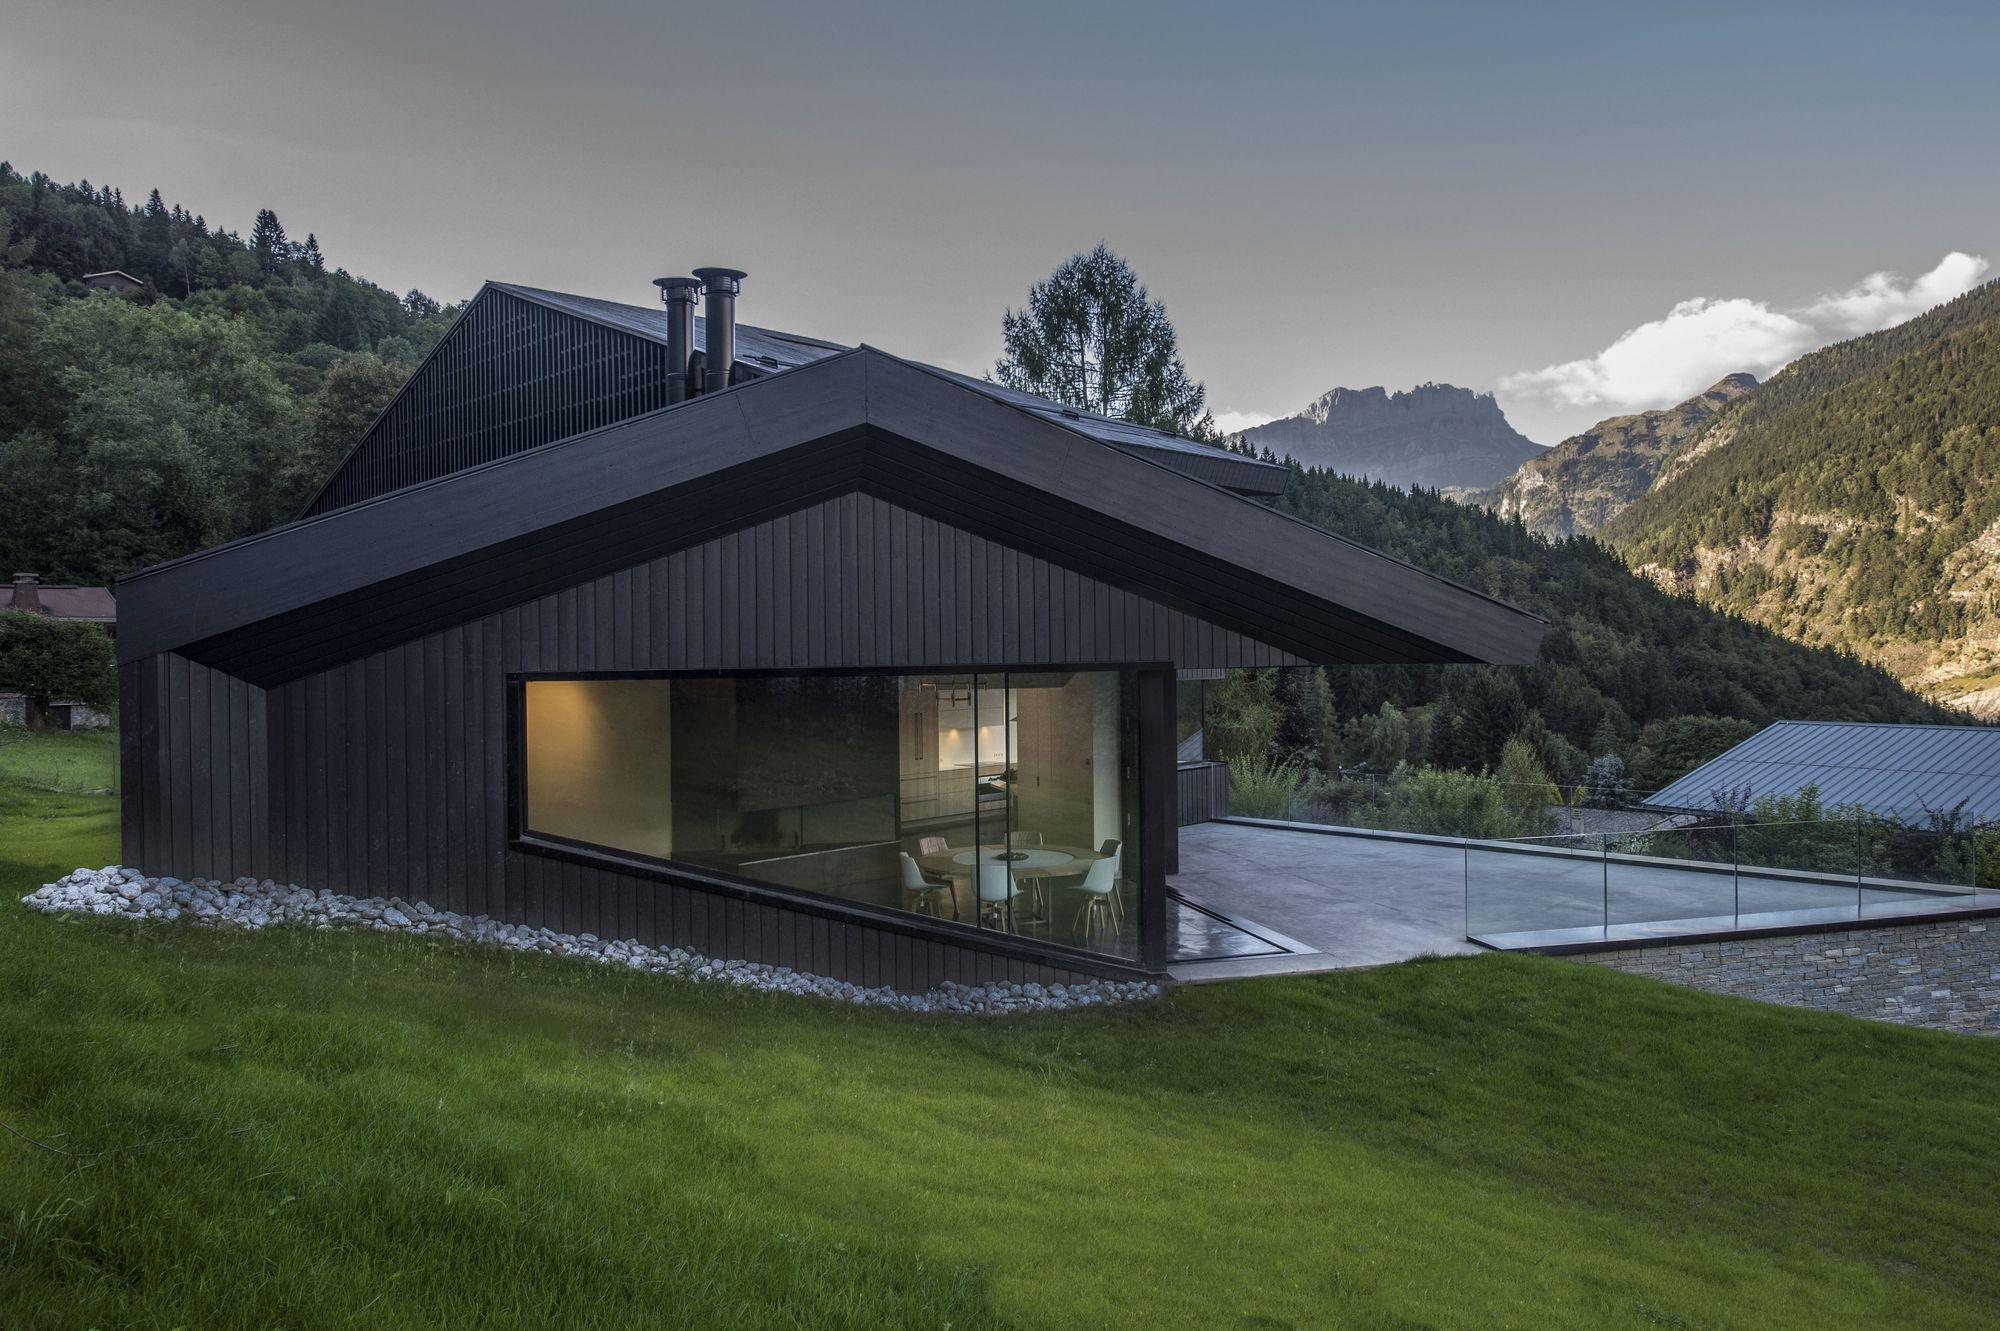 Cabaña en Chamonix / Pierre Marchand Architects